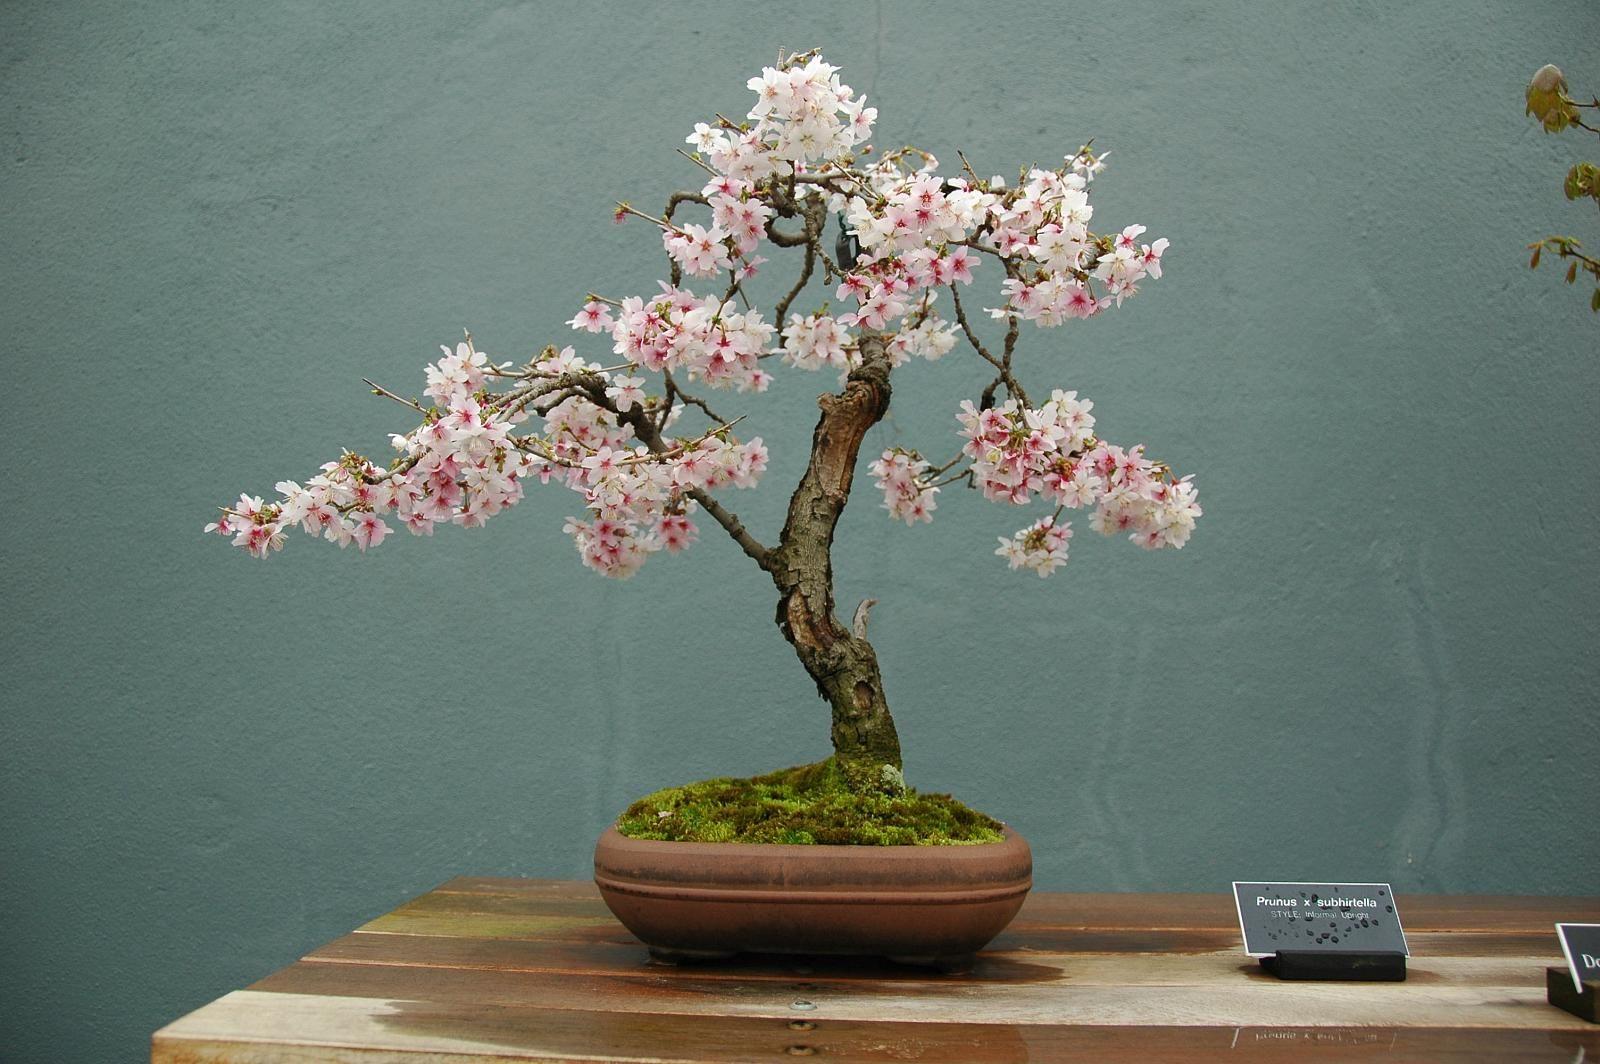 Rare Sakura Seeds Bonsai Flower Cherry Blossoms Tree Cherry Blossom Seeds Bonsai Plants For Home Bonsai Flower Cherry Blossom Bonsai Tree Bonsai Plants